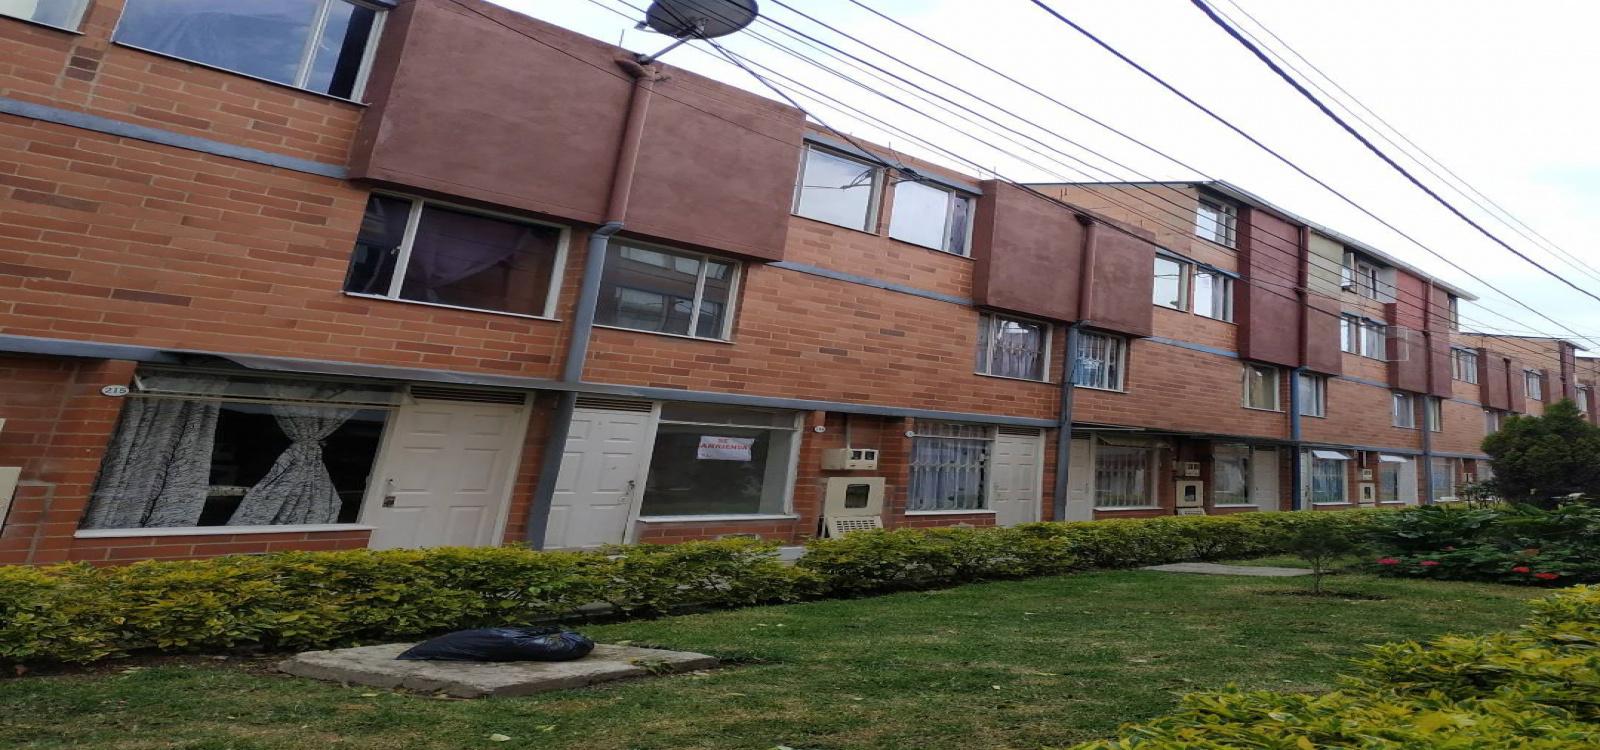 5 41 casa 214 TRANS 4 d, Soacha, San Mateo, San Mateo, 2 Habitaciones Habitaciones,1 BañoBathrooms,Casas,Venta,conjunto bosques de zapan 4,TRANS 4 d,3333